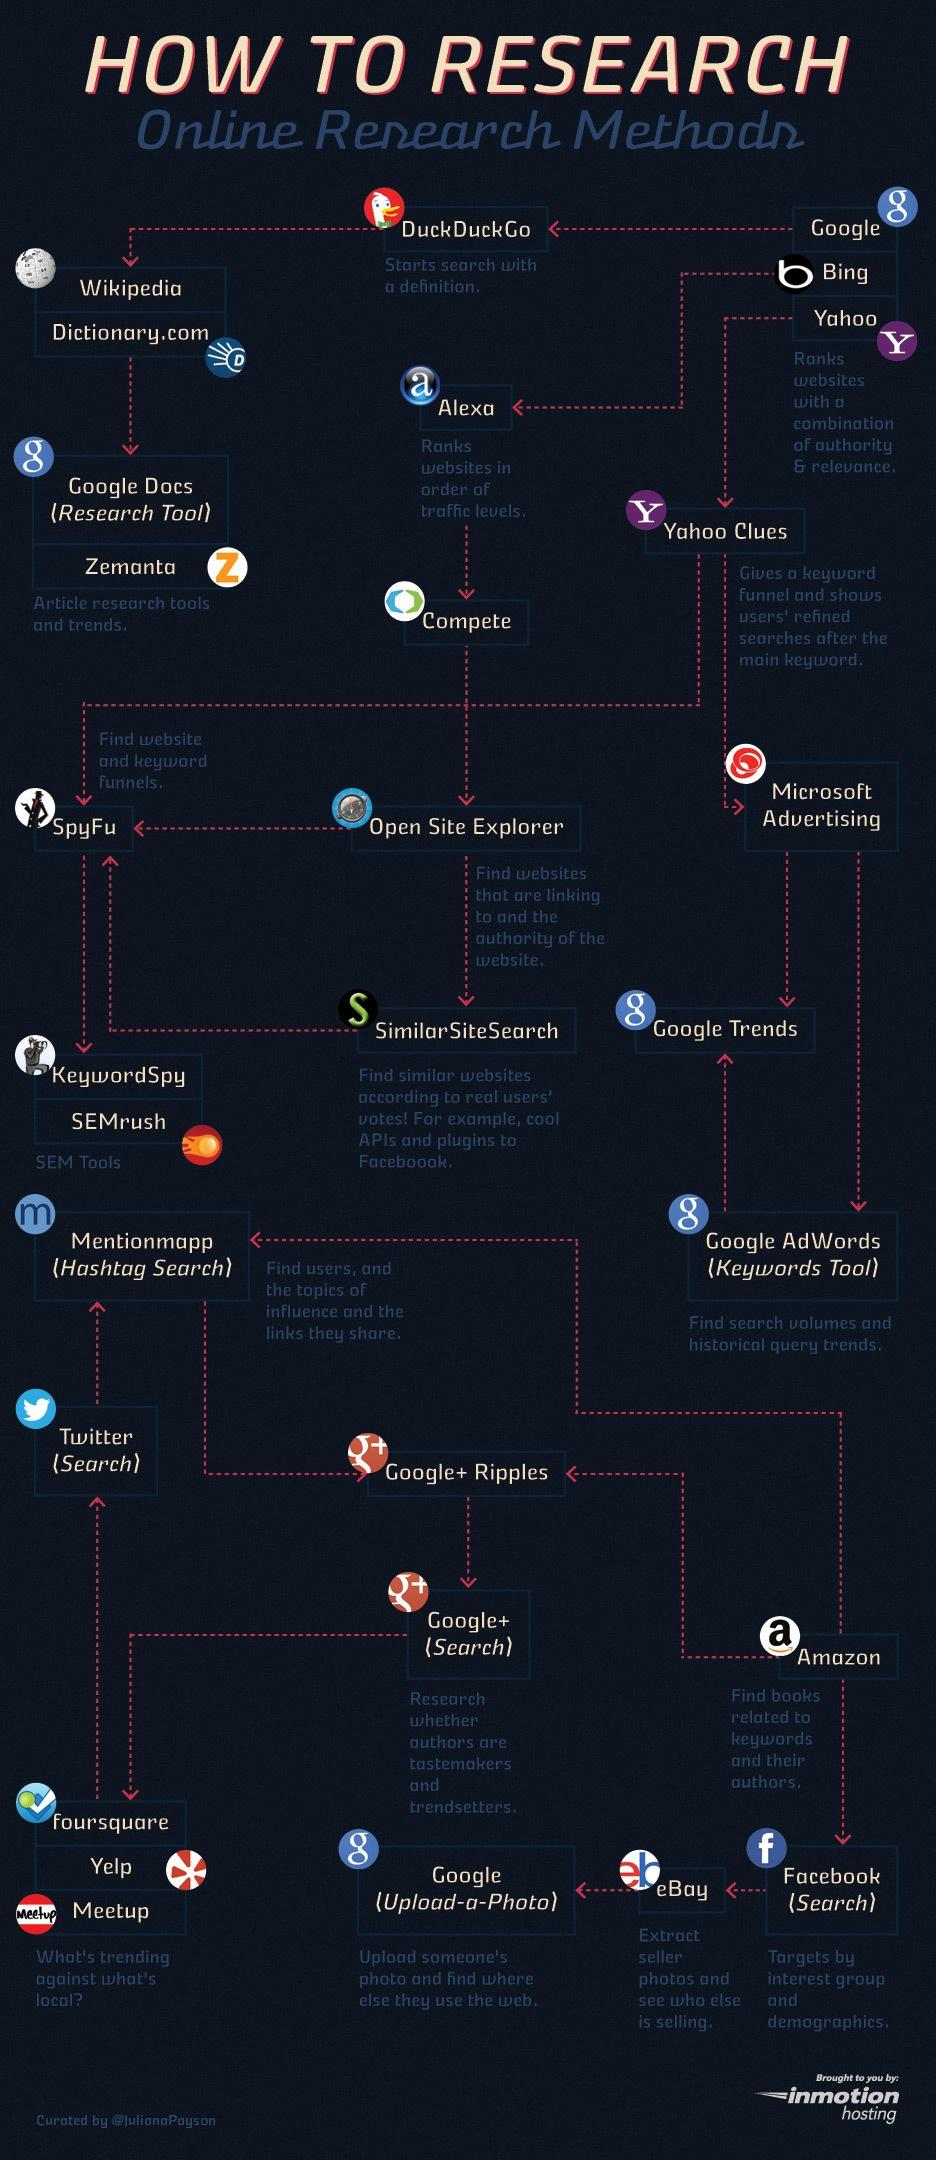 Internet research methodology